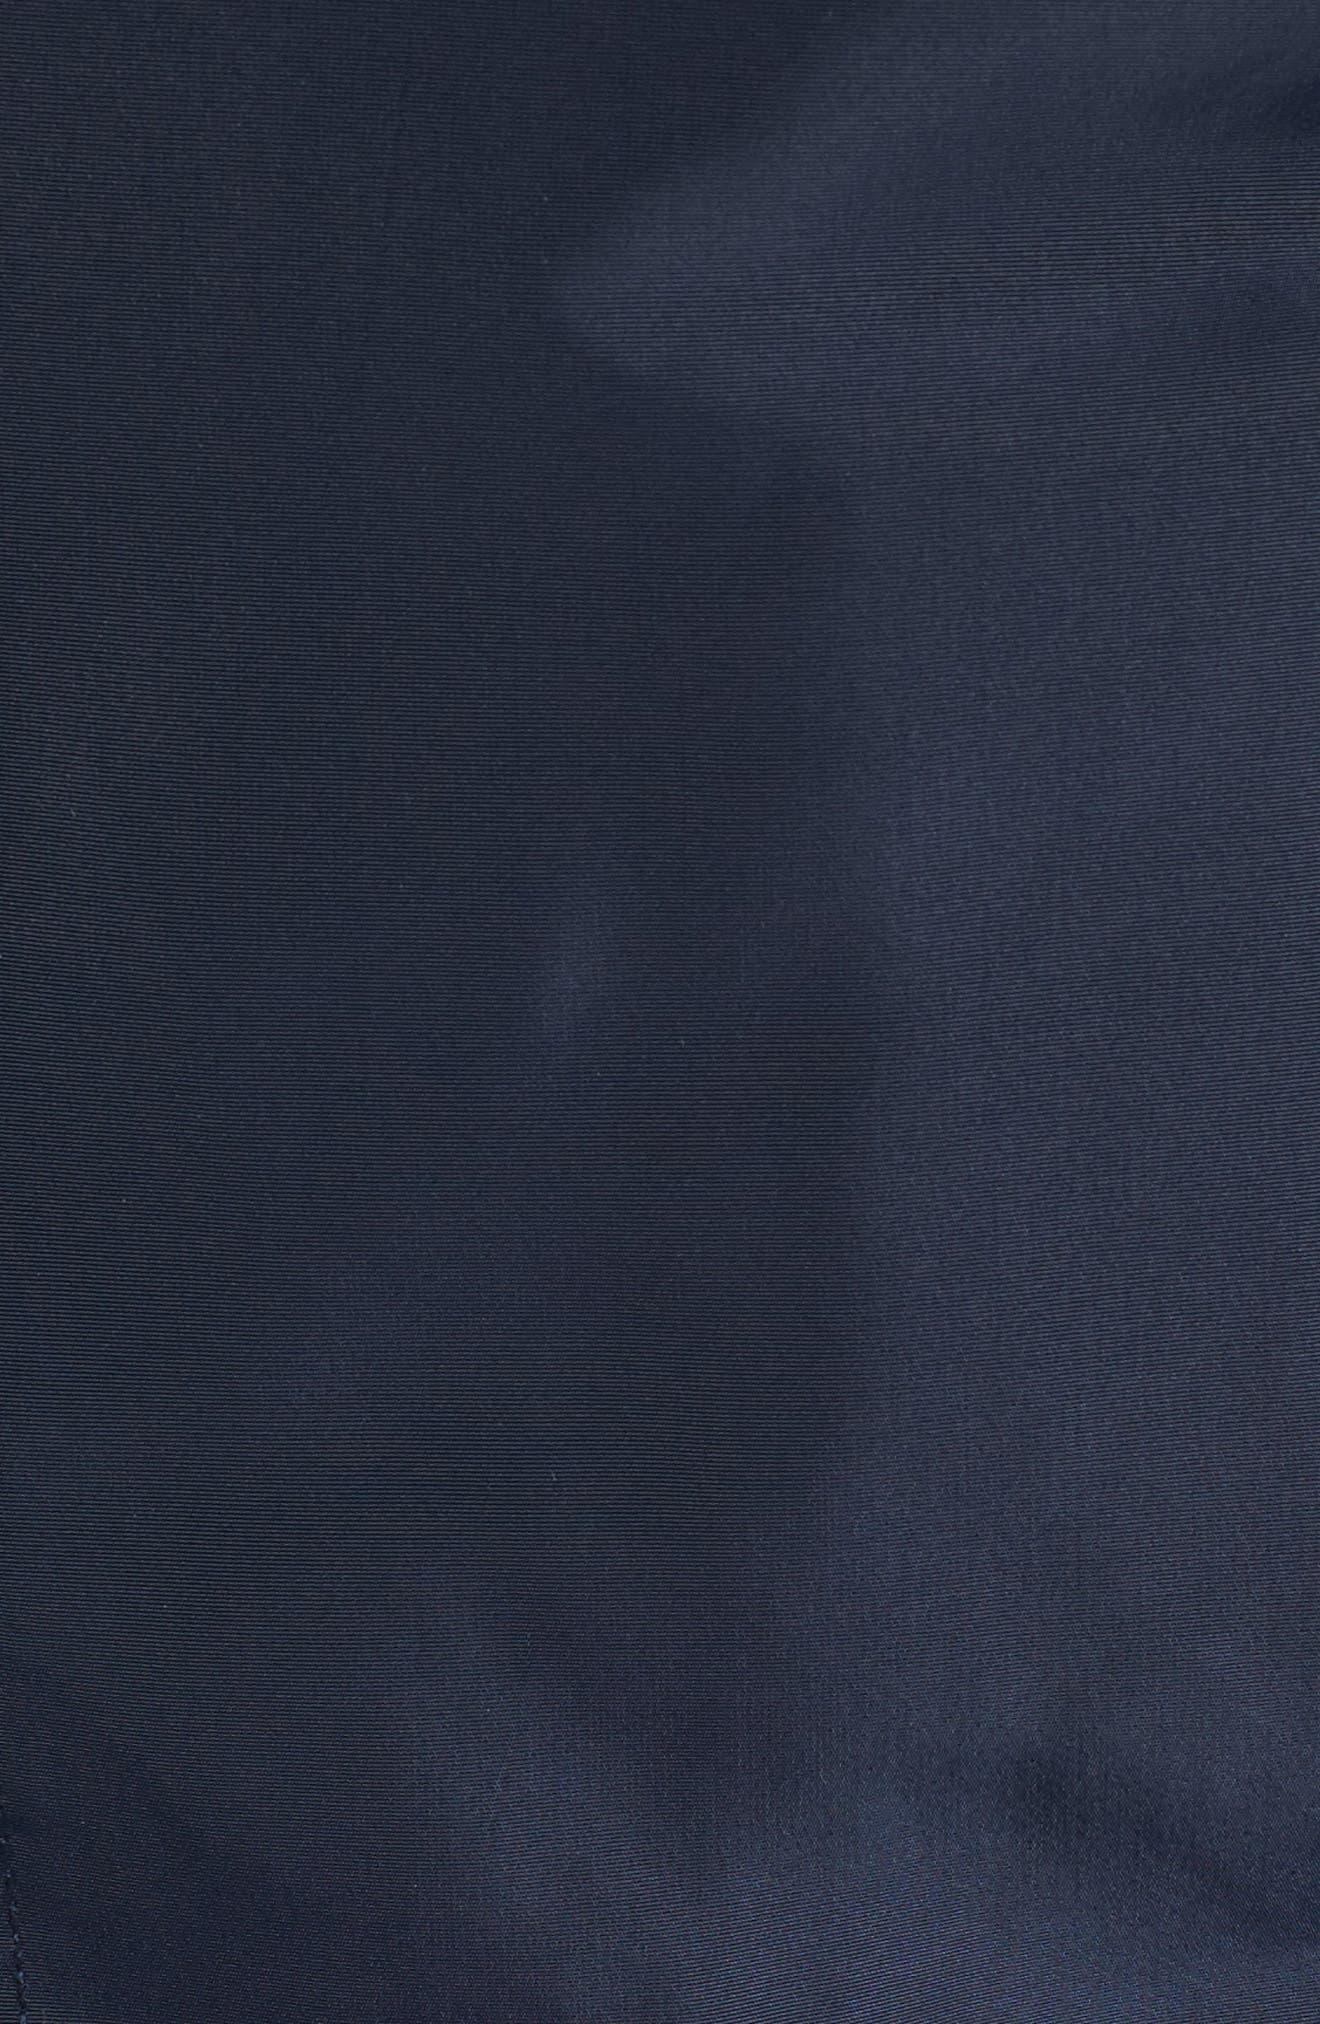 Hooded Windbreaker Jacket,                             Alternate thumbnail 6, color,                             410